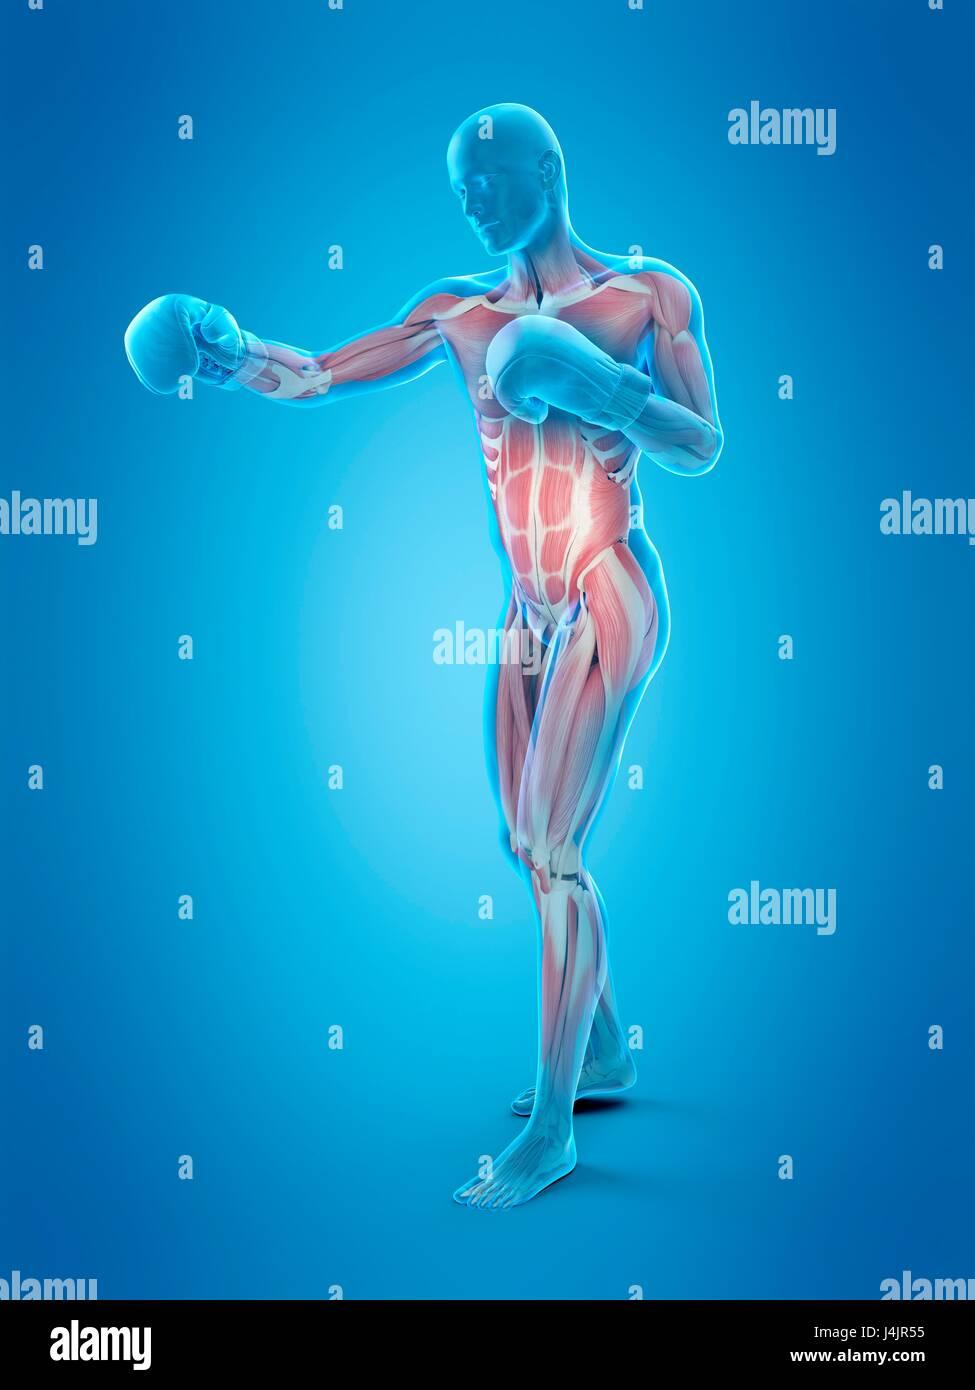 Estructura muscular de un boxeador, ilustración. Imagen De Stock